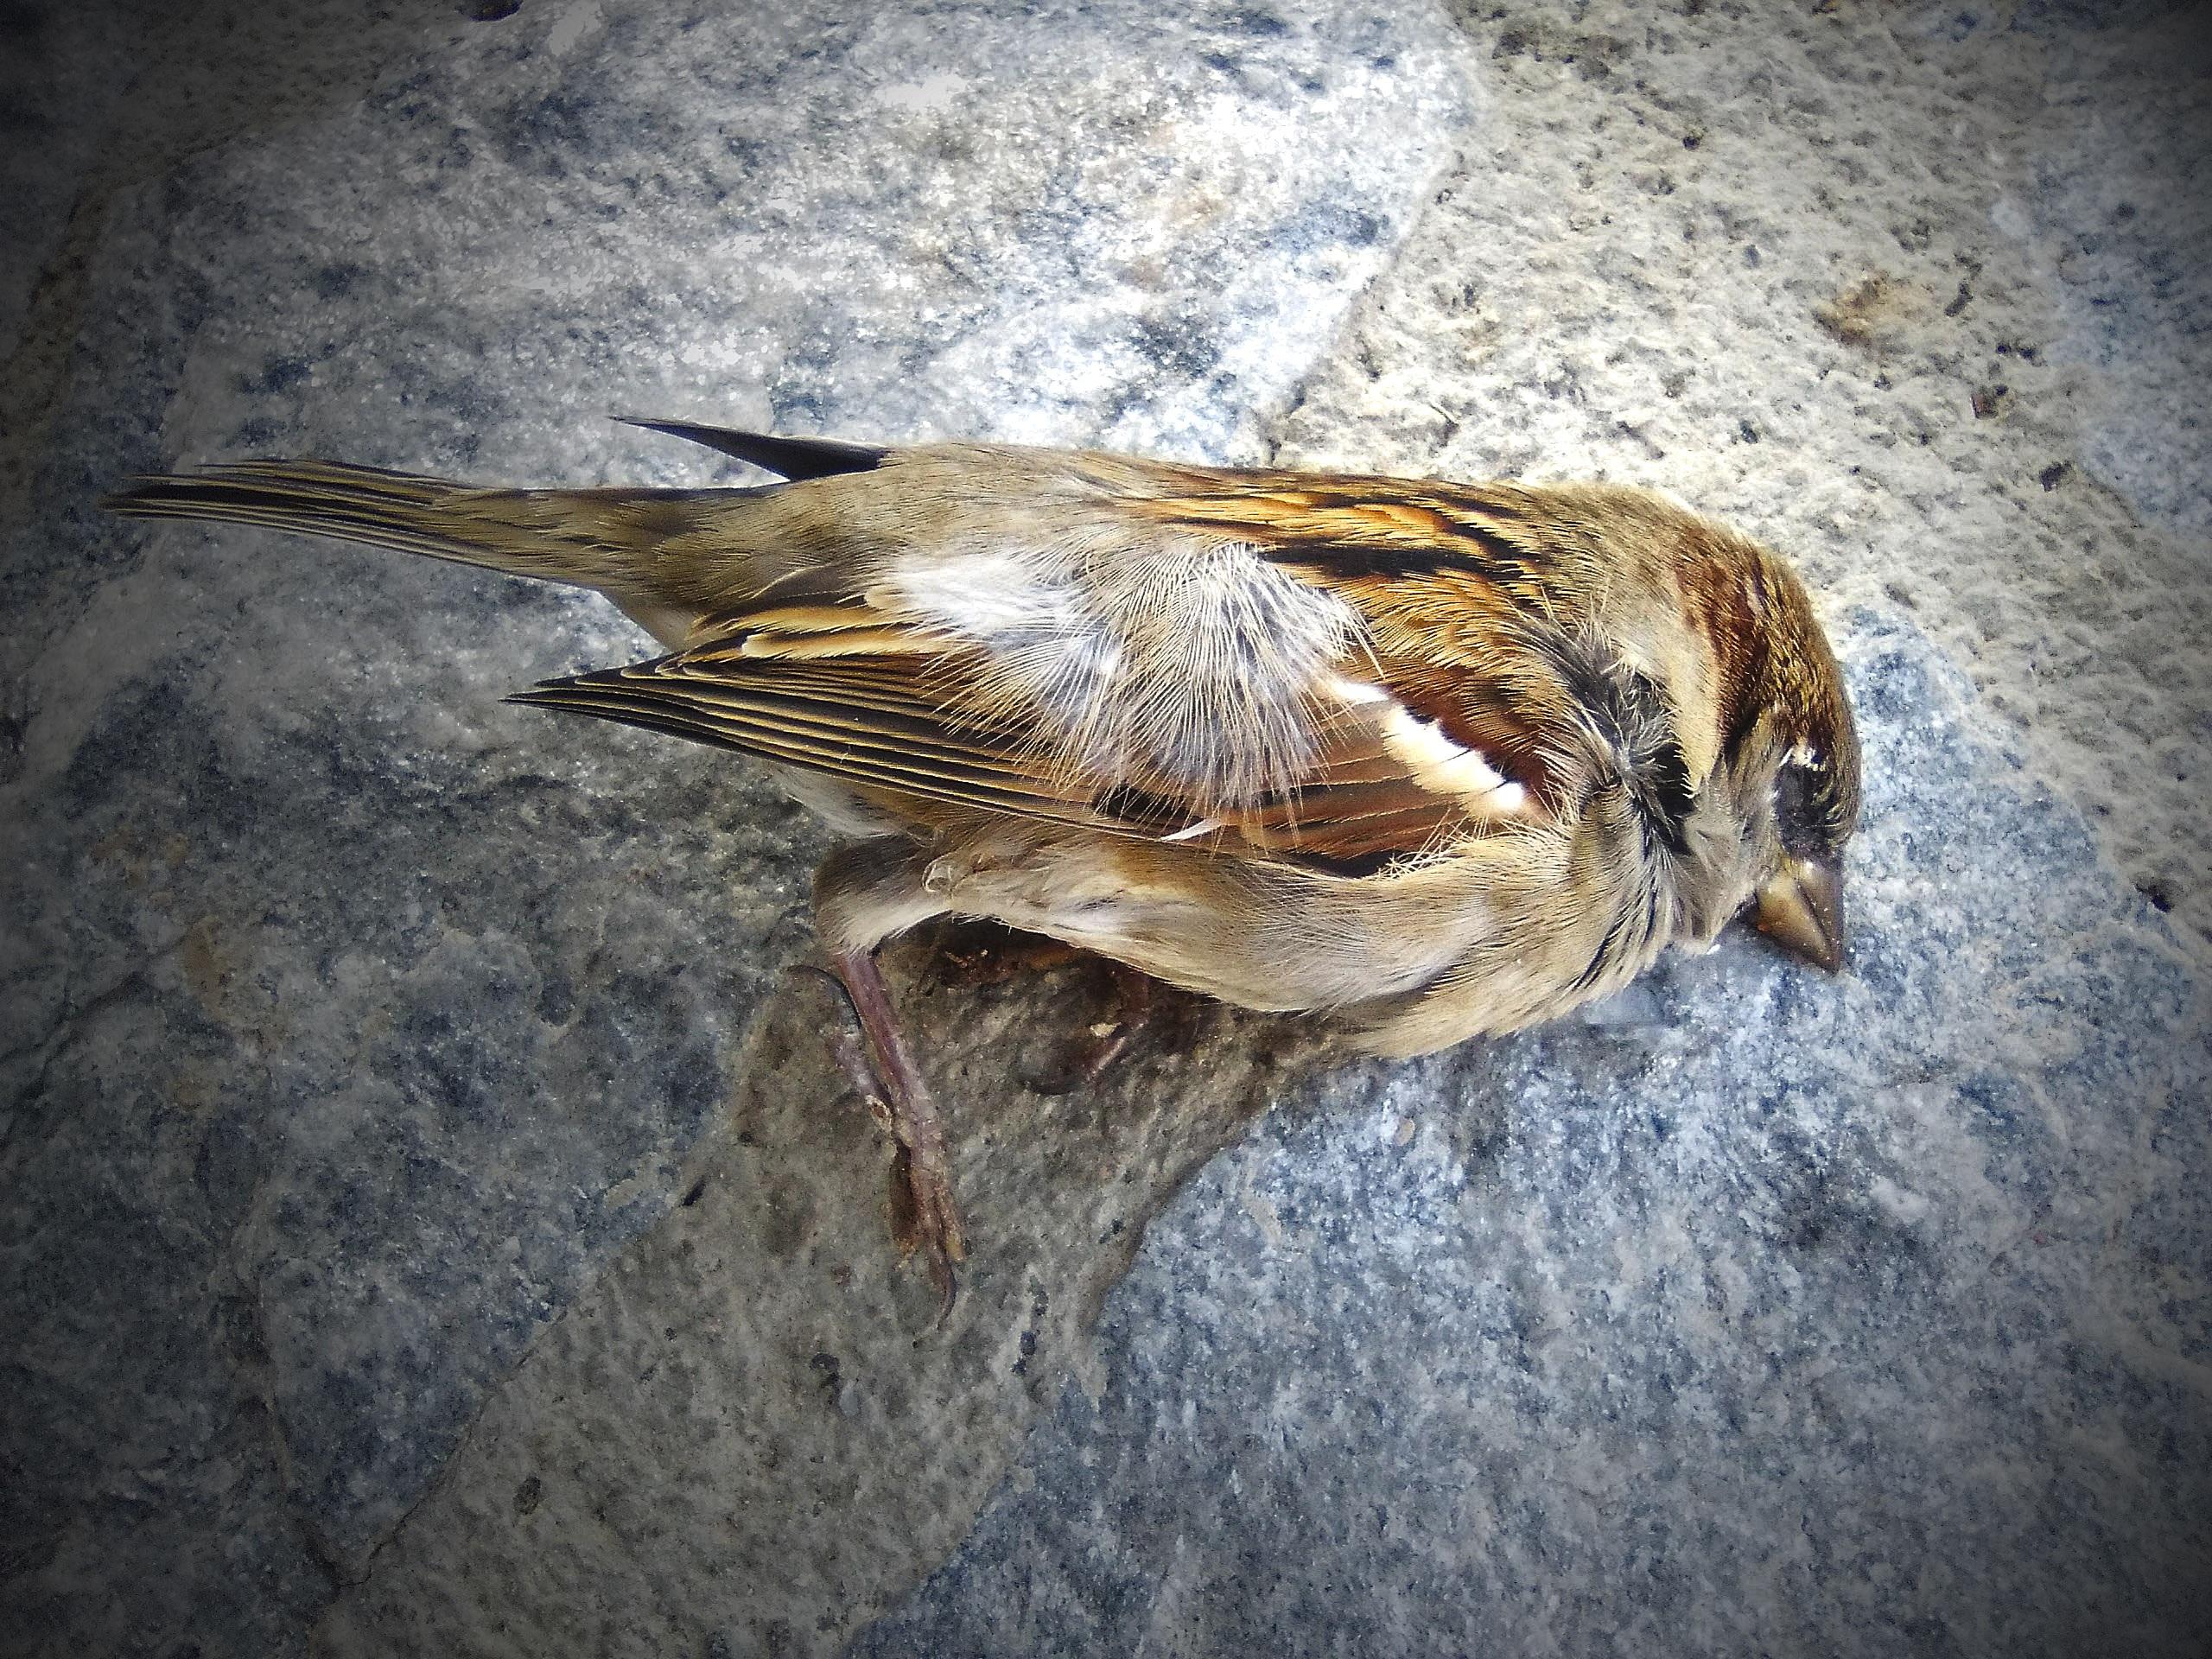 Gambar Sayap Paruh Fauna Bertulang Belakang Burung Gereja Finch Metafora Mendiang House Sparrow Kelebihan Burung Mati Bertengger Burung 2560x1920 844108 Galeri Foto Pxhere